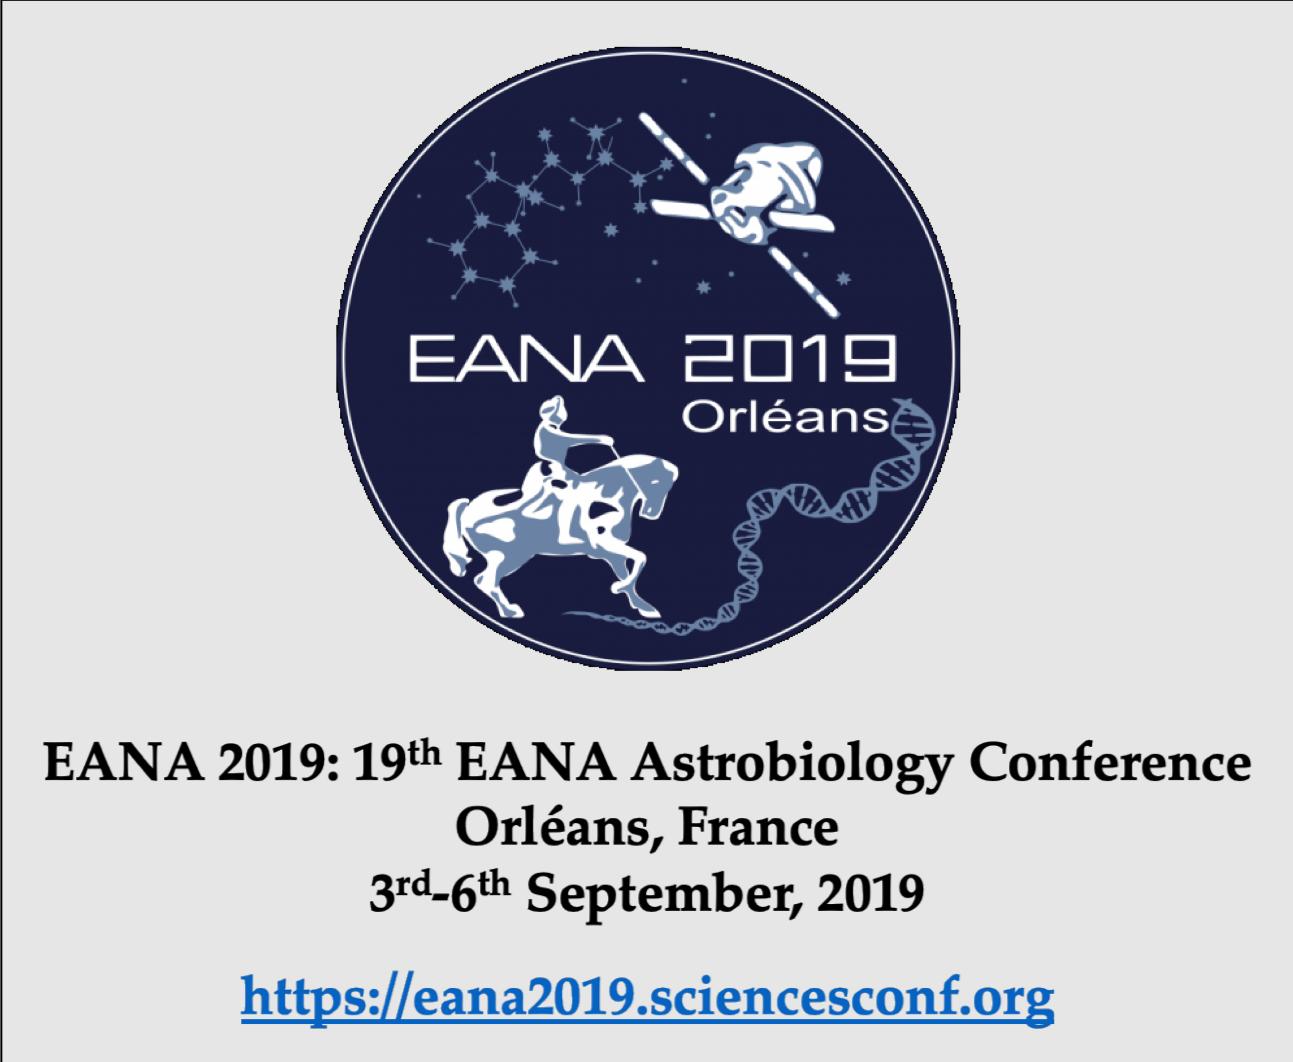 EANA - European Astrobiology Network Association